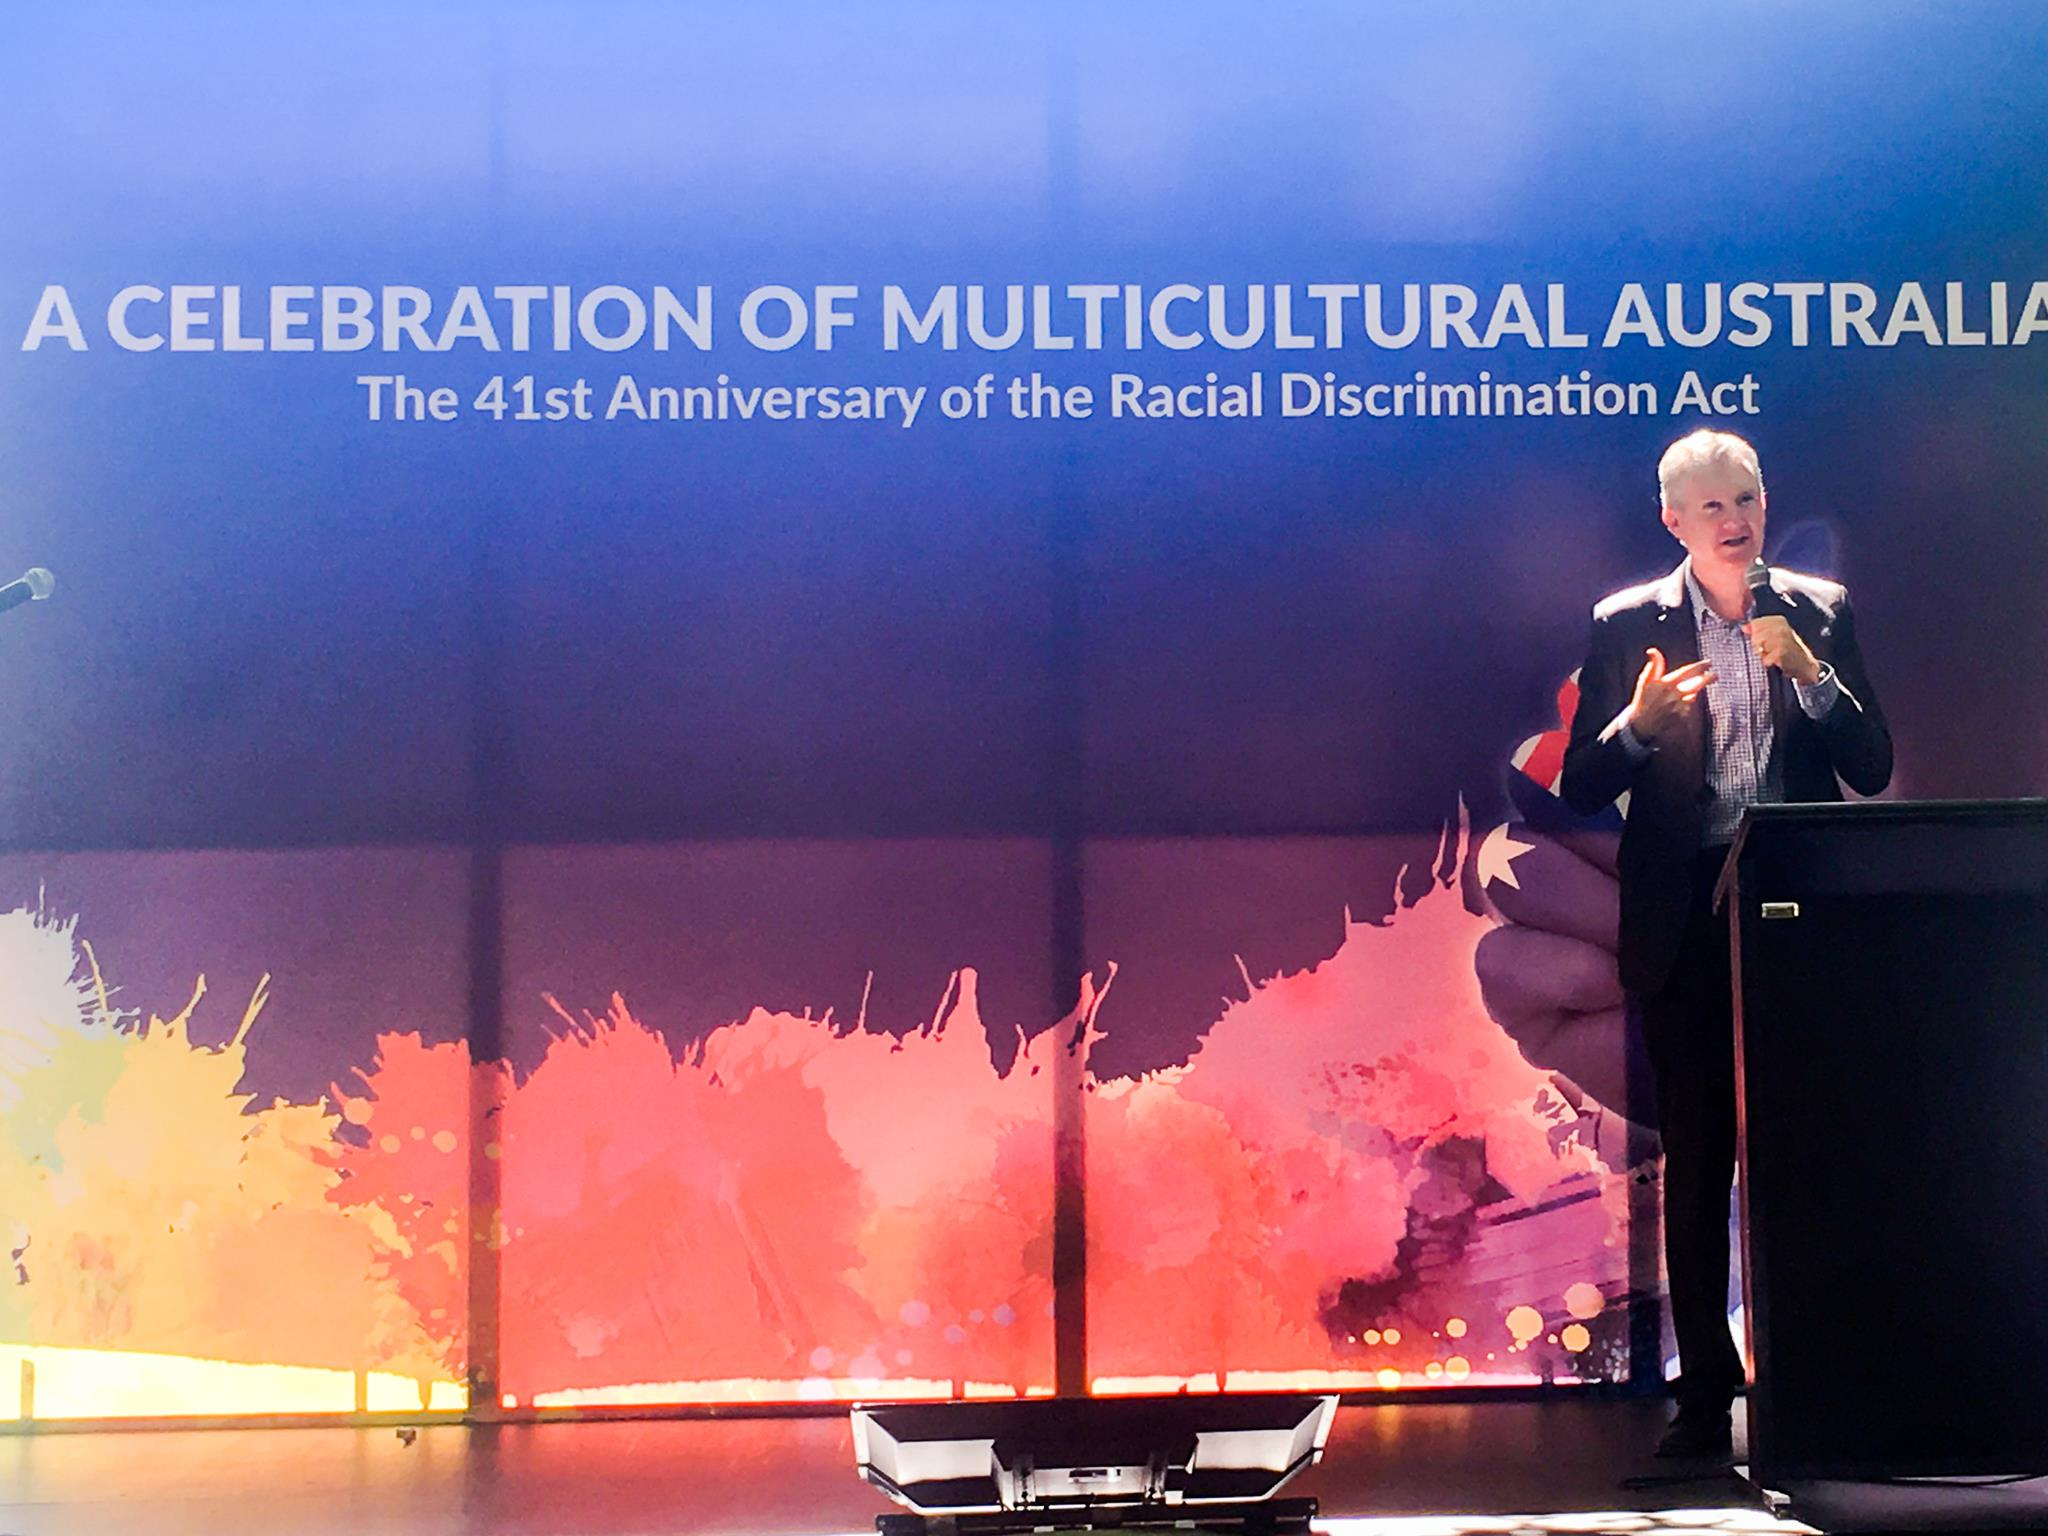 multicultural australia banner tony speech.jpg